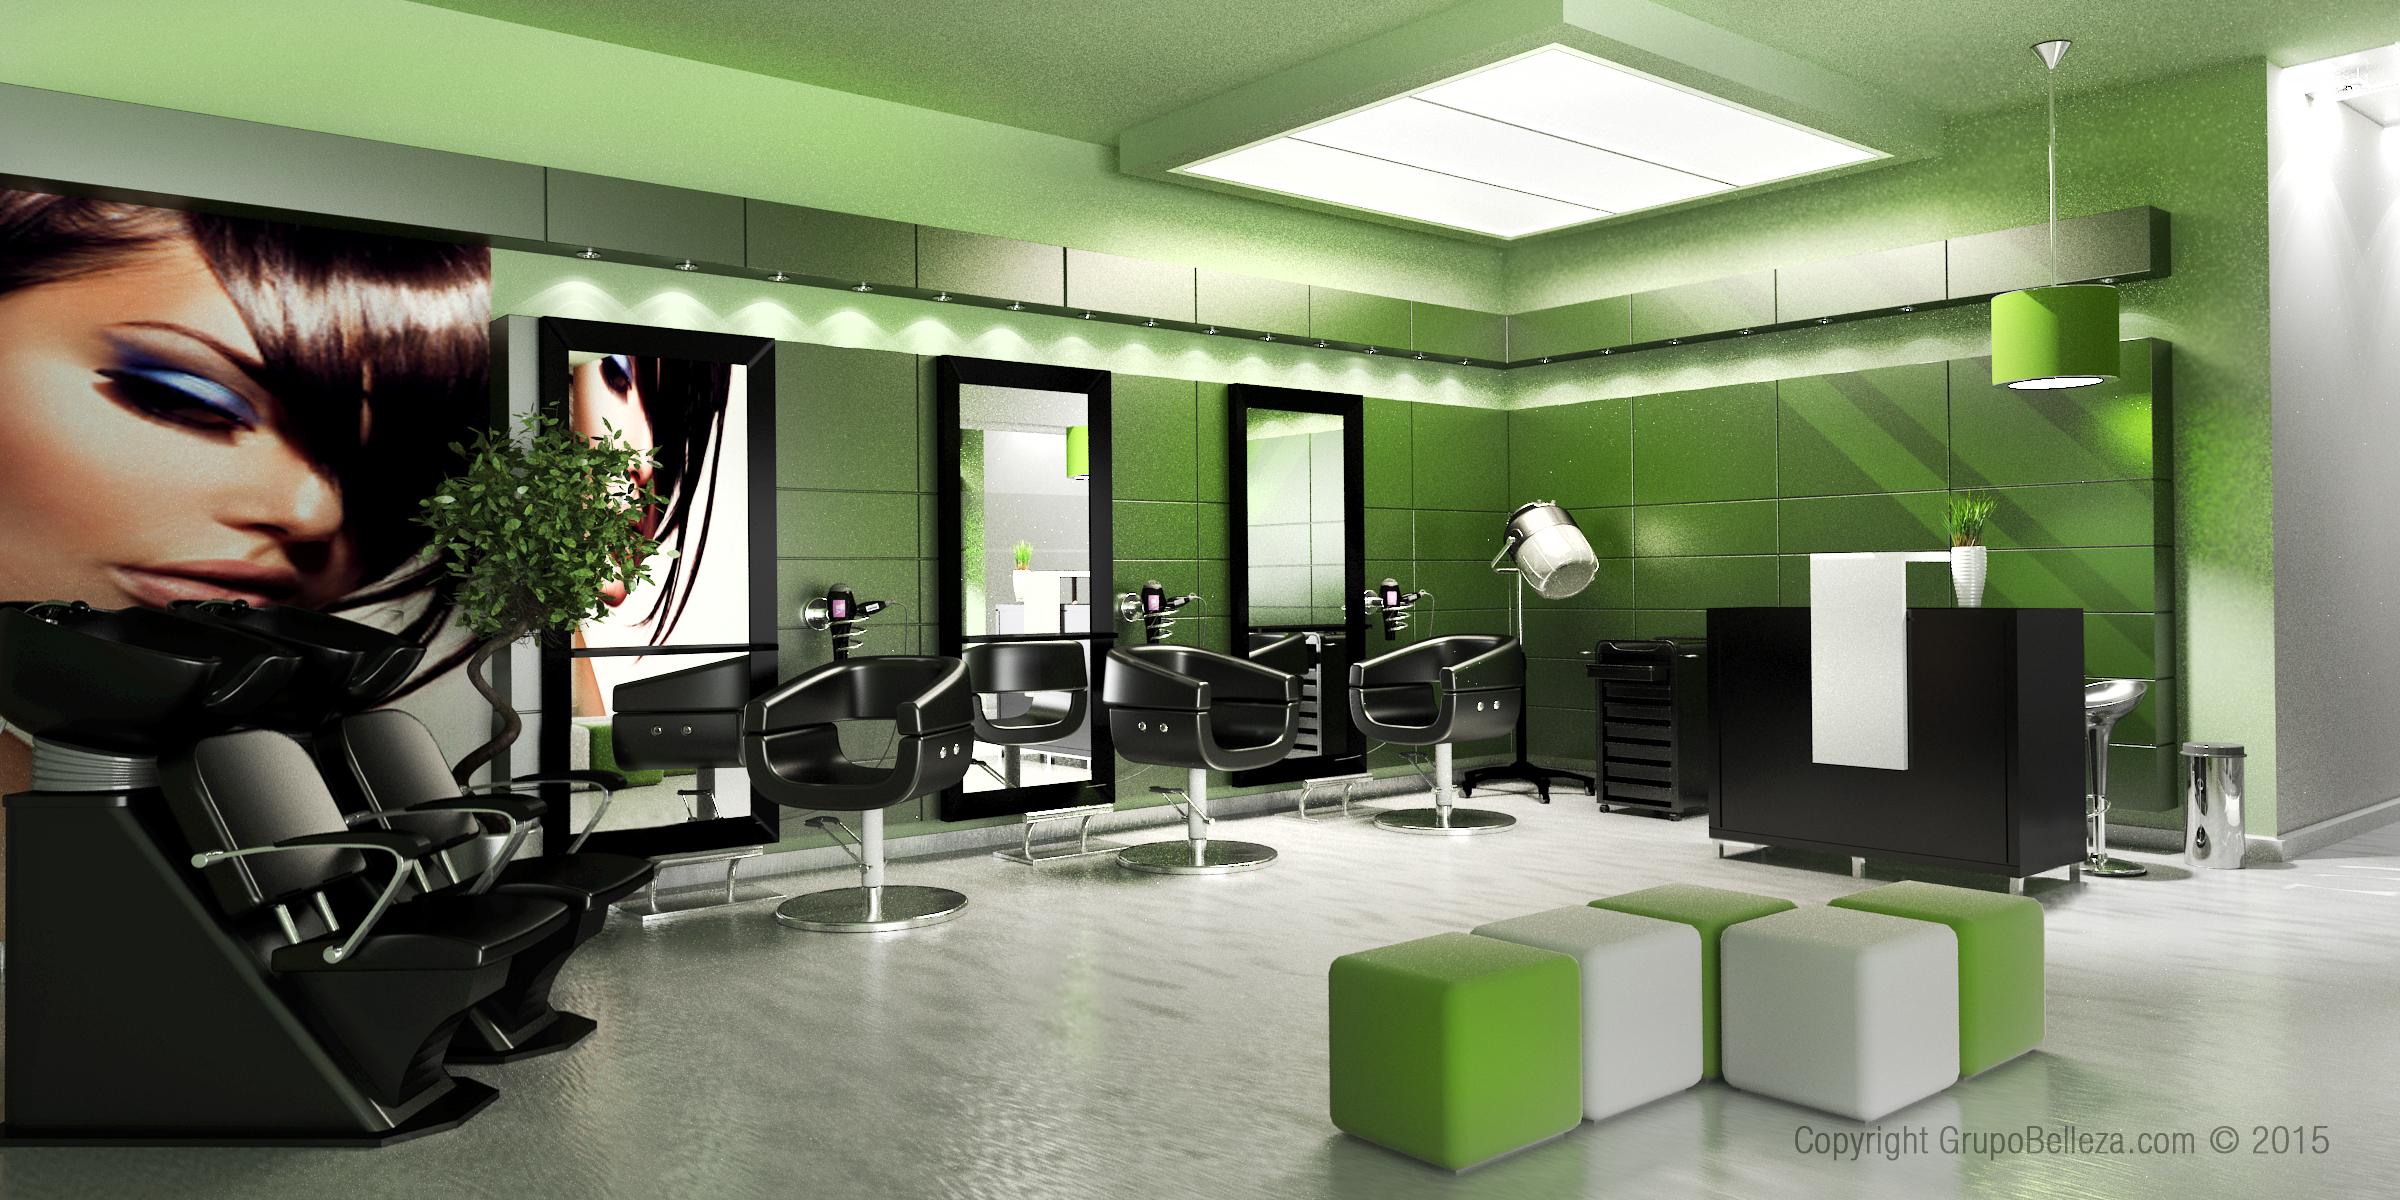 Conjunto misku estudio de dise o 3d barcelona blog Diseno de peluquerias